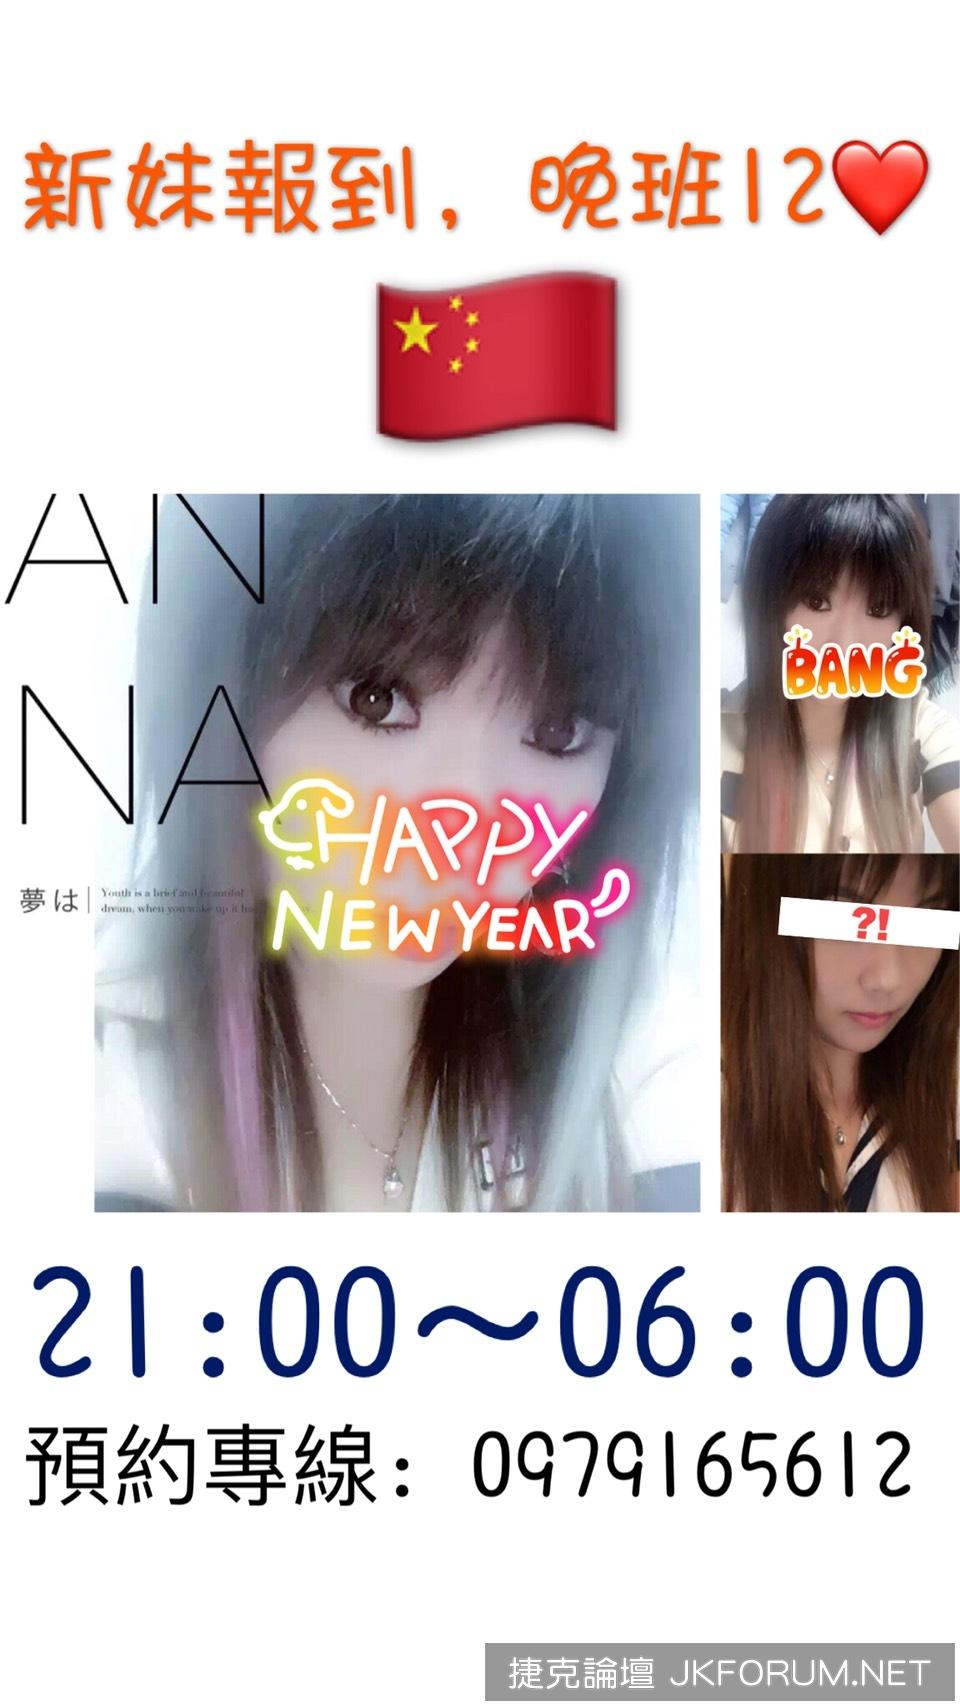 S__25550961.jpg